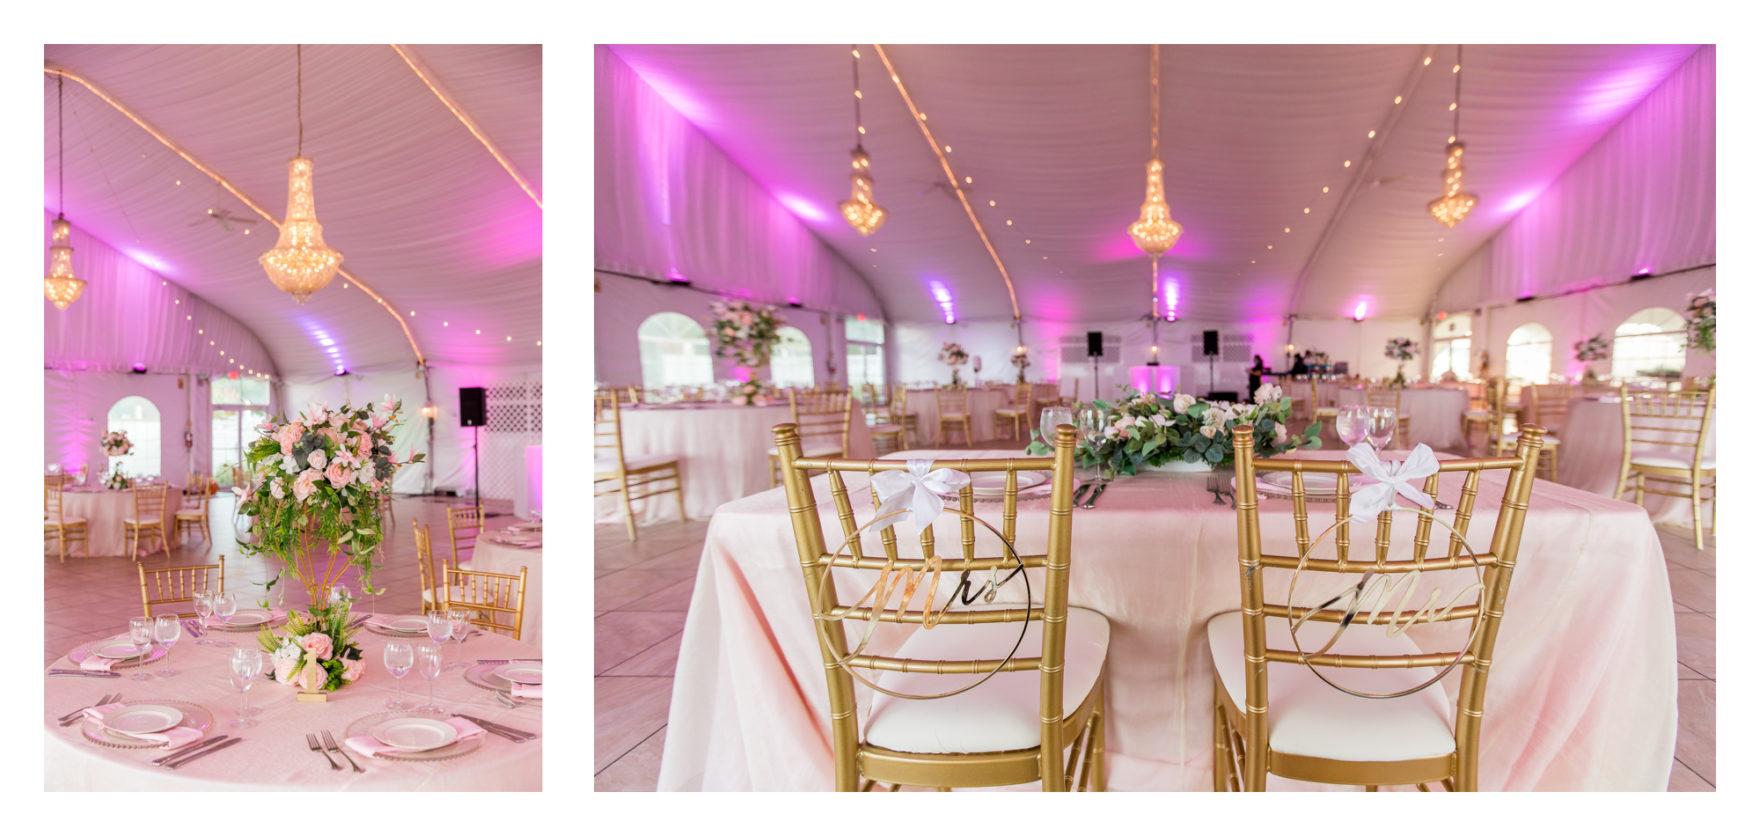 Halloween Wedding. Bayfront wedding. Chesapeake bay. Waterfront wedding. Blush Wedding. Covid reschedule. Covid-19 Wedding.